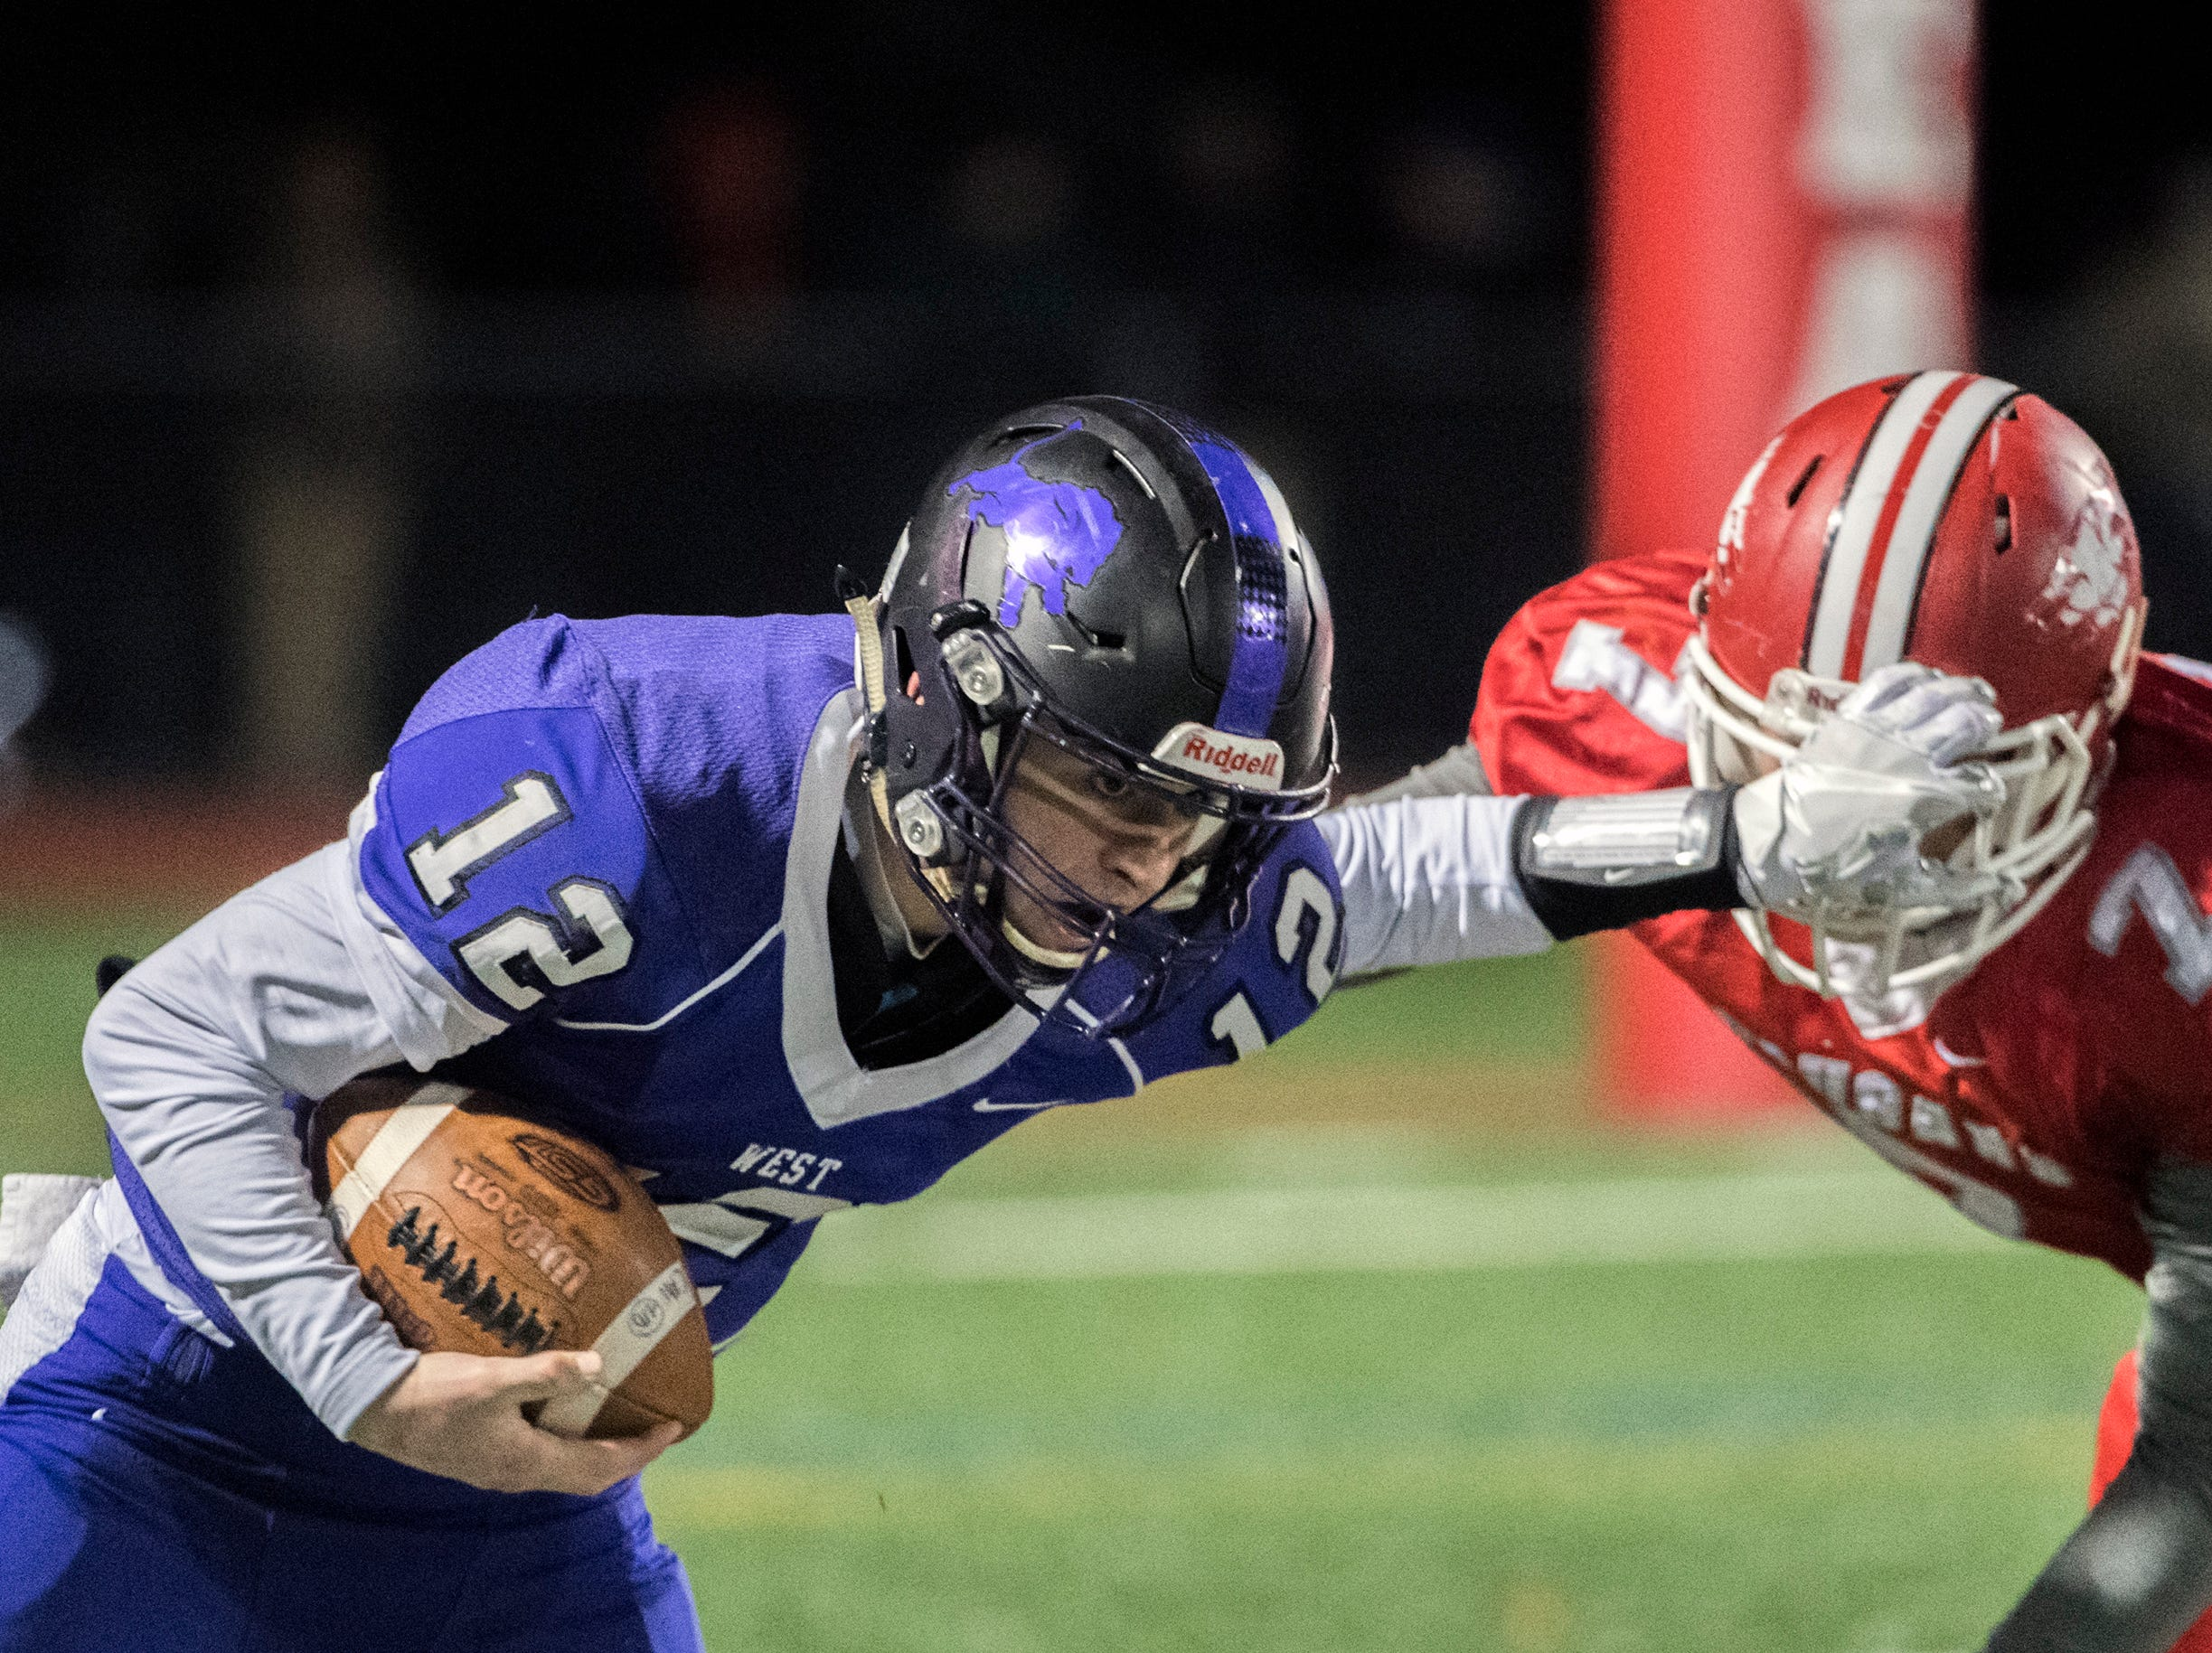 West quarterback Nick Arcaroli (12) stiff-arms East's Nick Gazzola (7) Wednesday, Nov. 21, 2018 at Cherry Hill West High School in Cherry Hill, N.J.